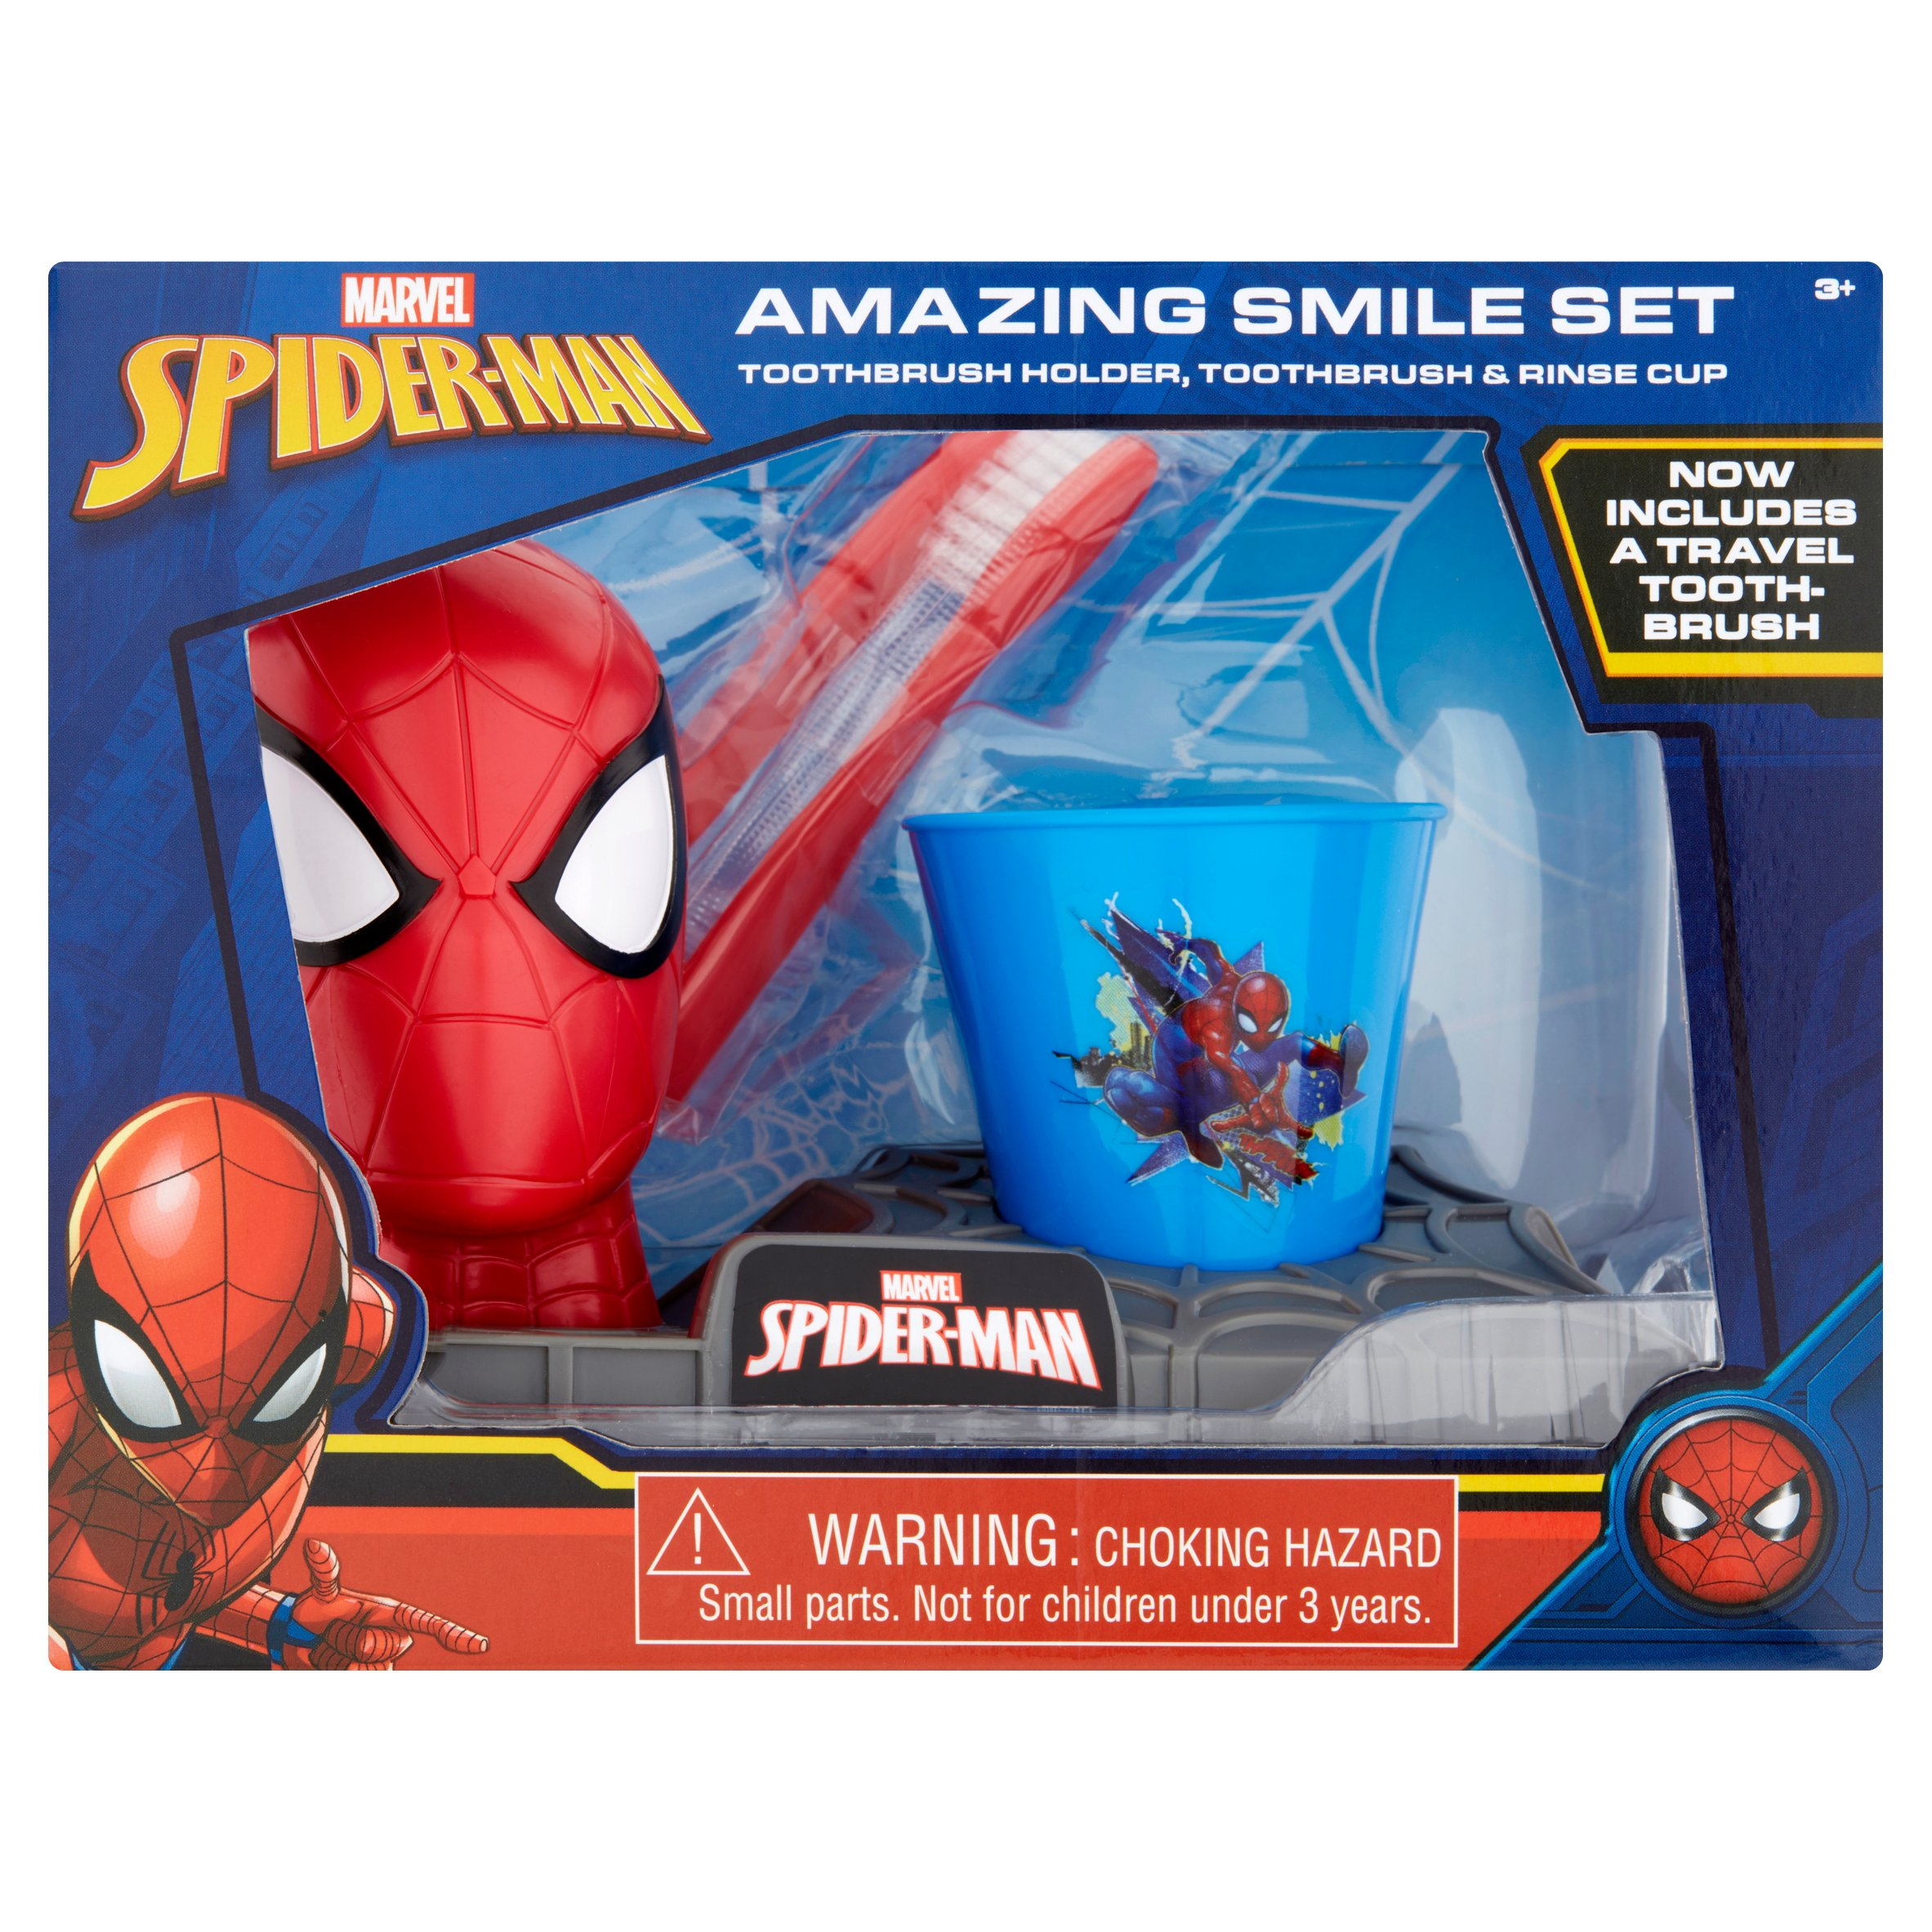 Marvel Spiderman Toothbrush, Toothbrush Holder, Rinse Cup Gift Set, 3pcs    Walmart.com